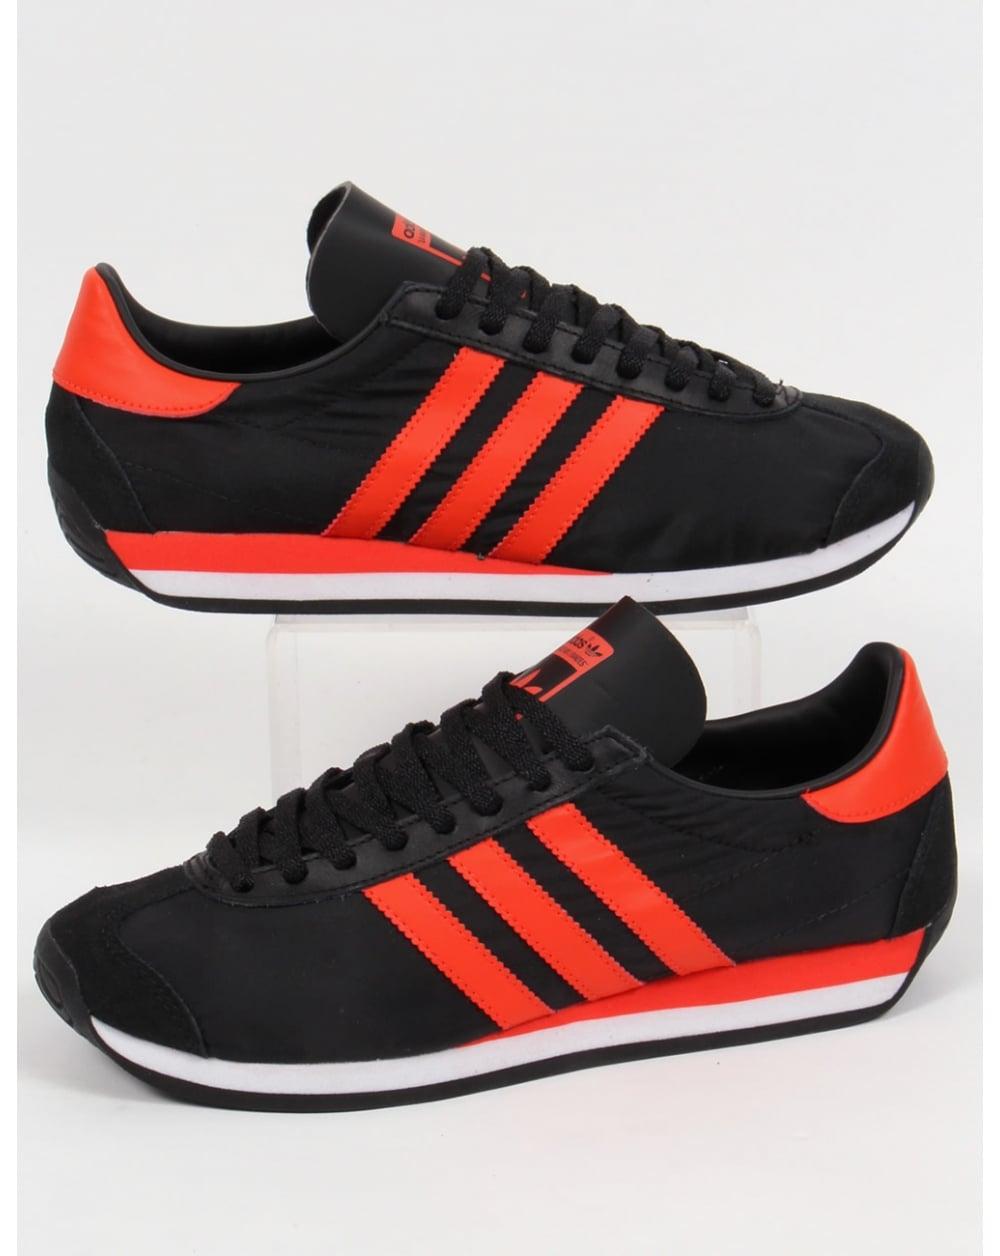 adidas Spezial shoes black orange